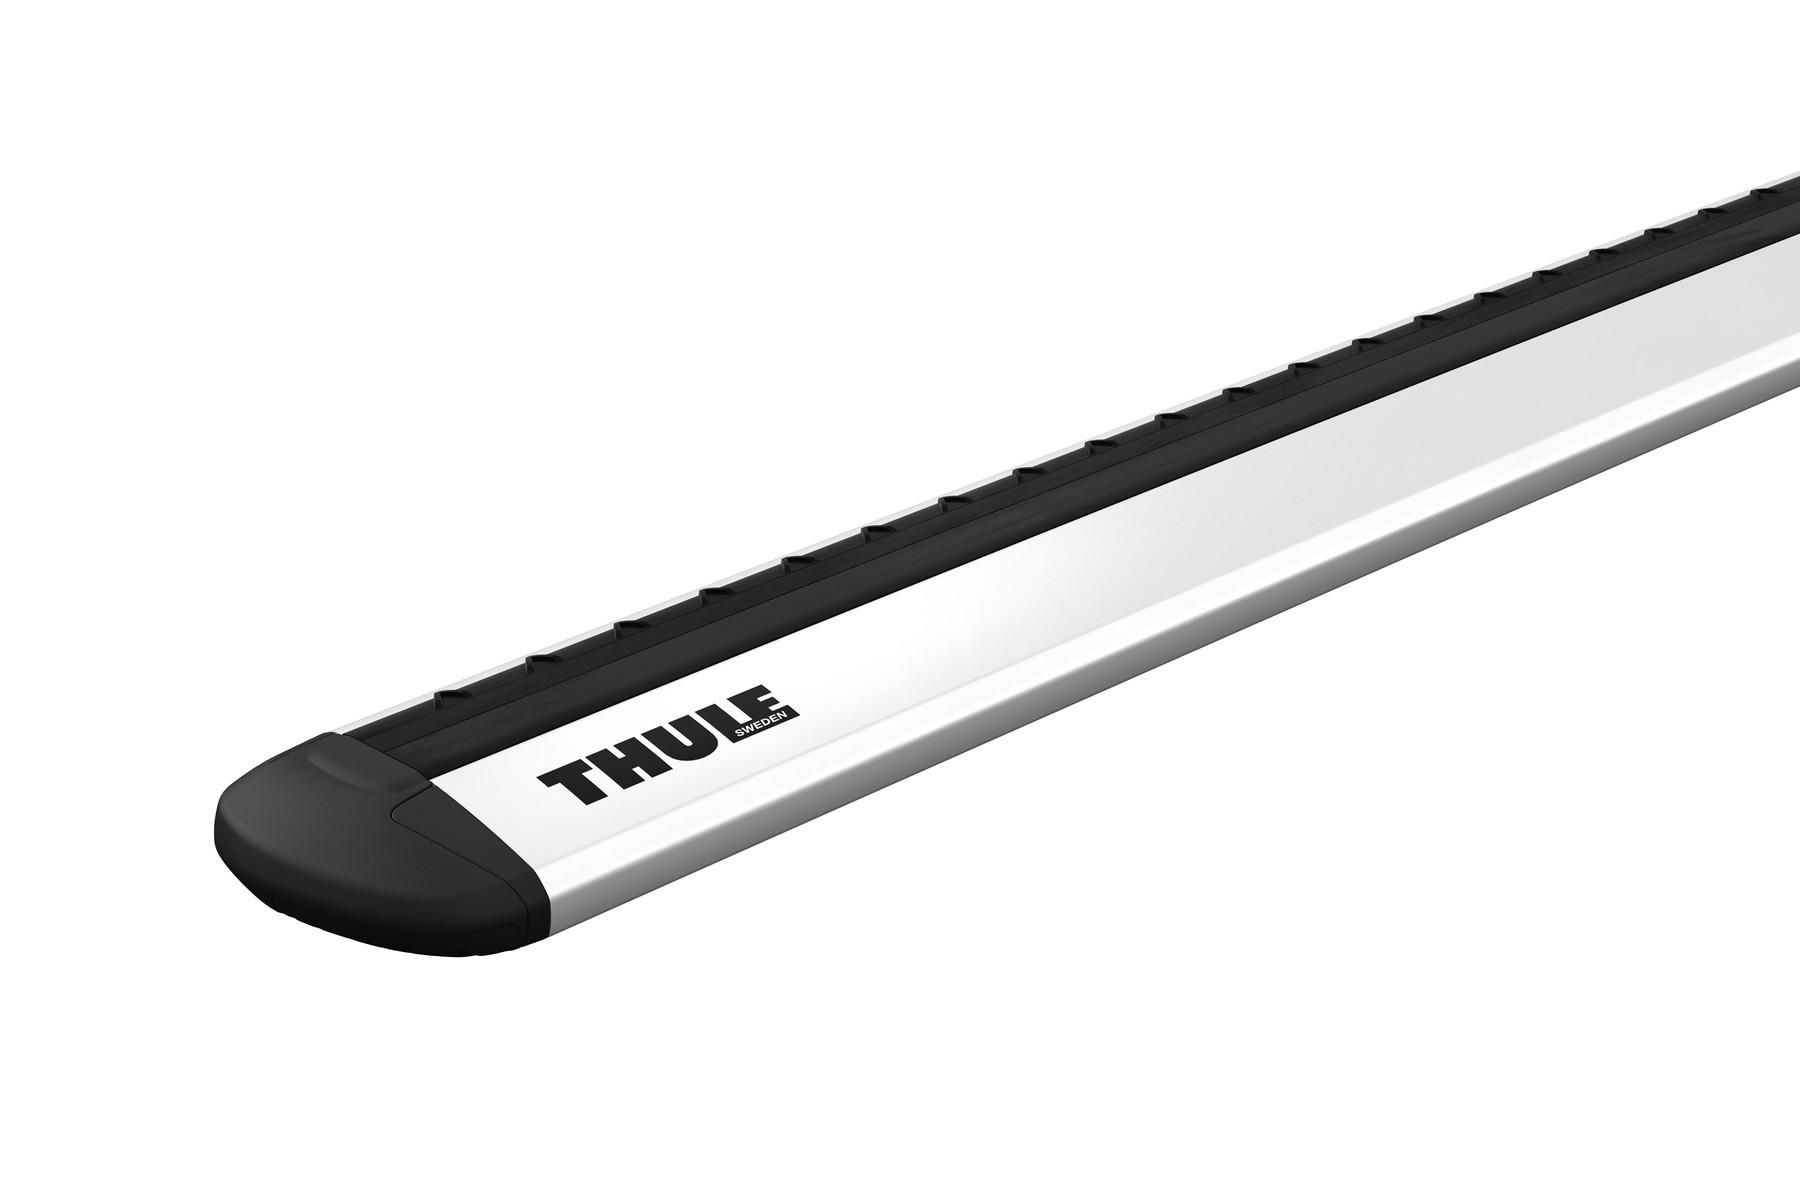 Barra Thule Aluminio WingBar Evo 127cm (7113) THULE 2 Barras